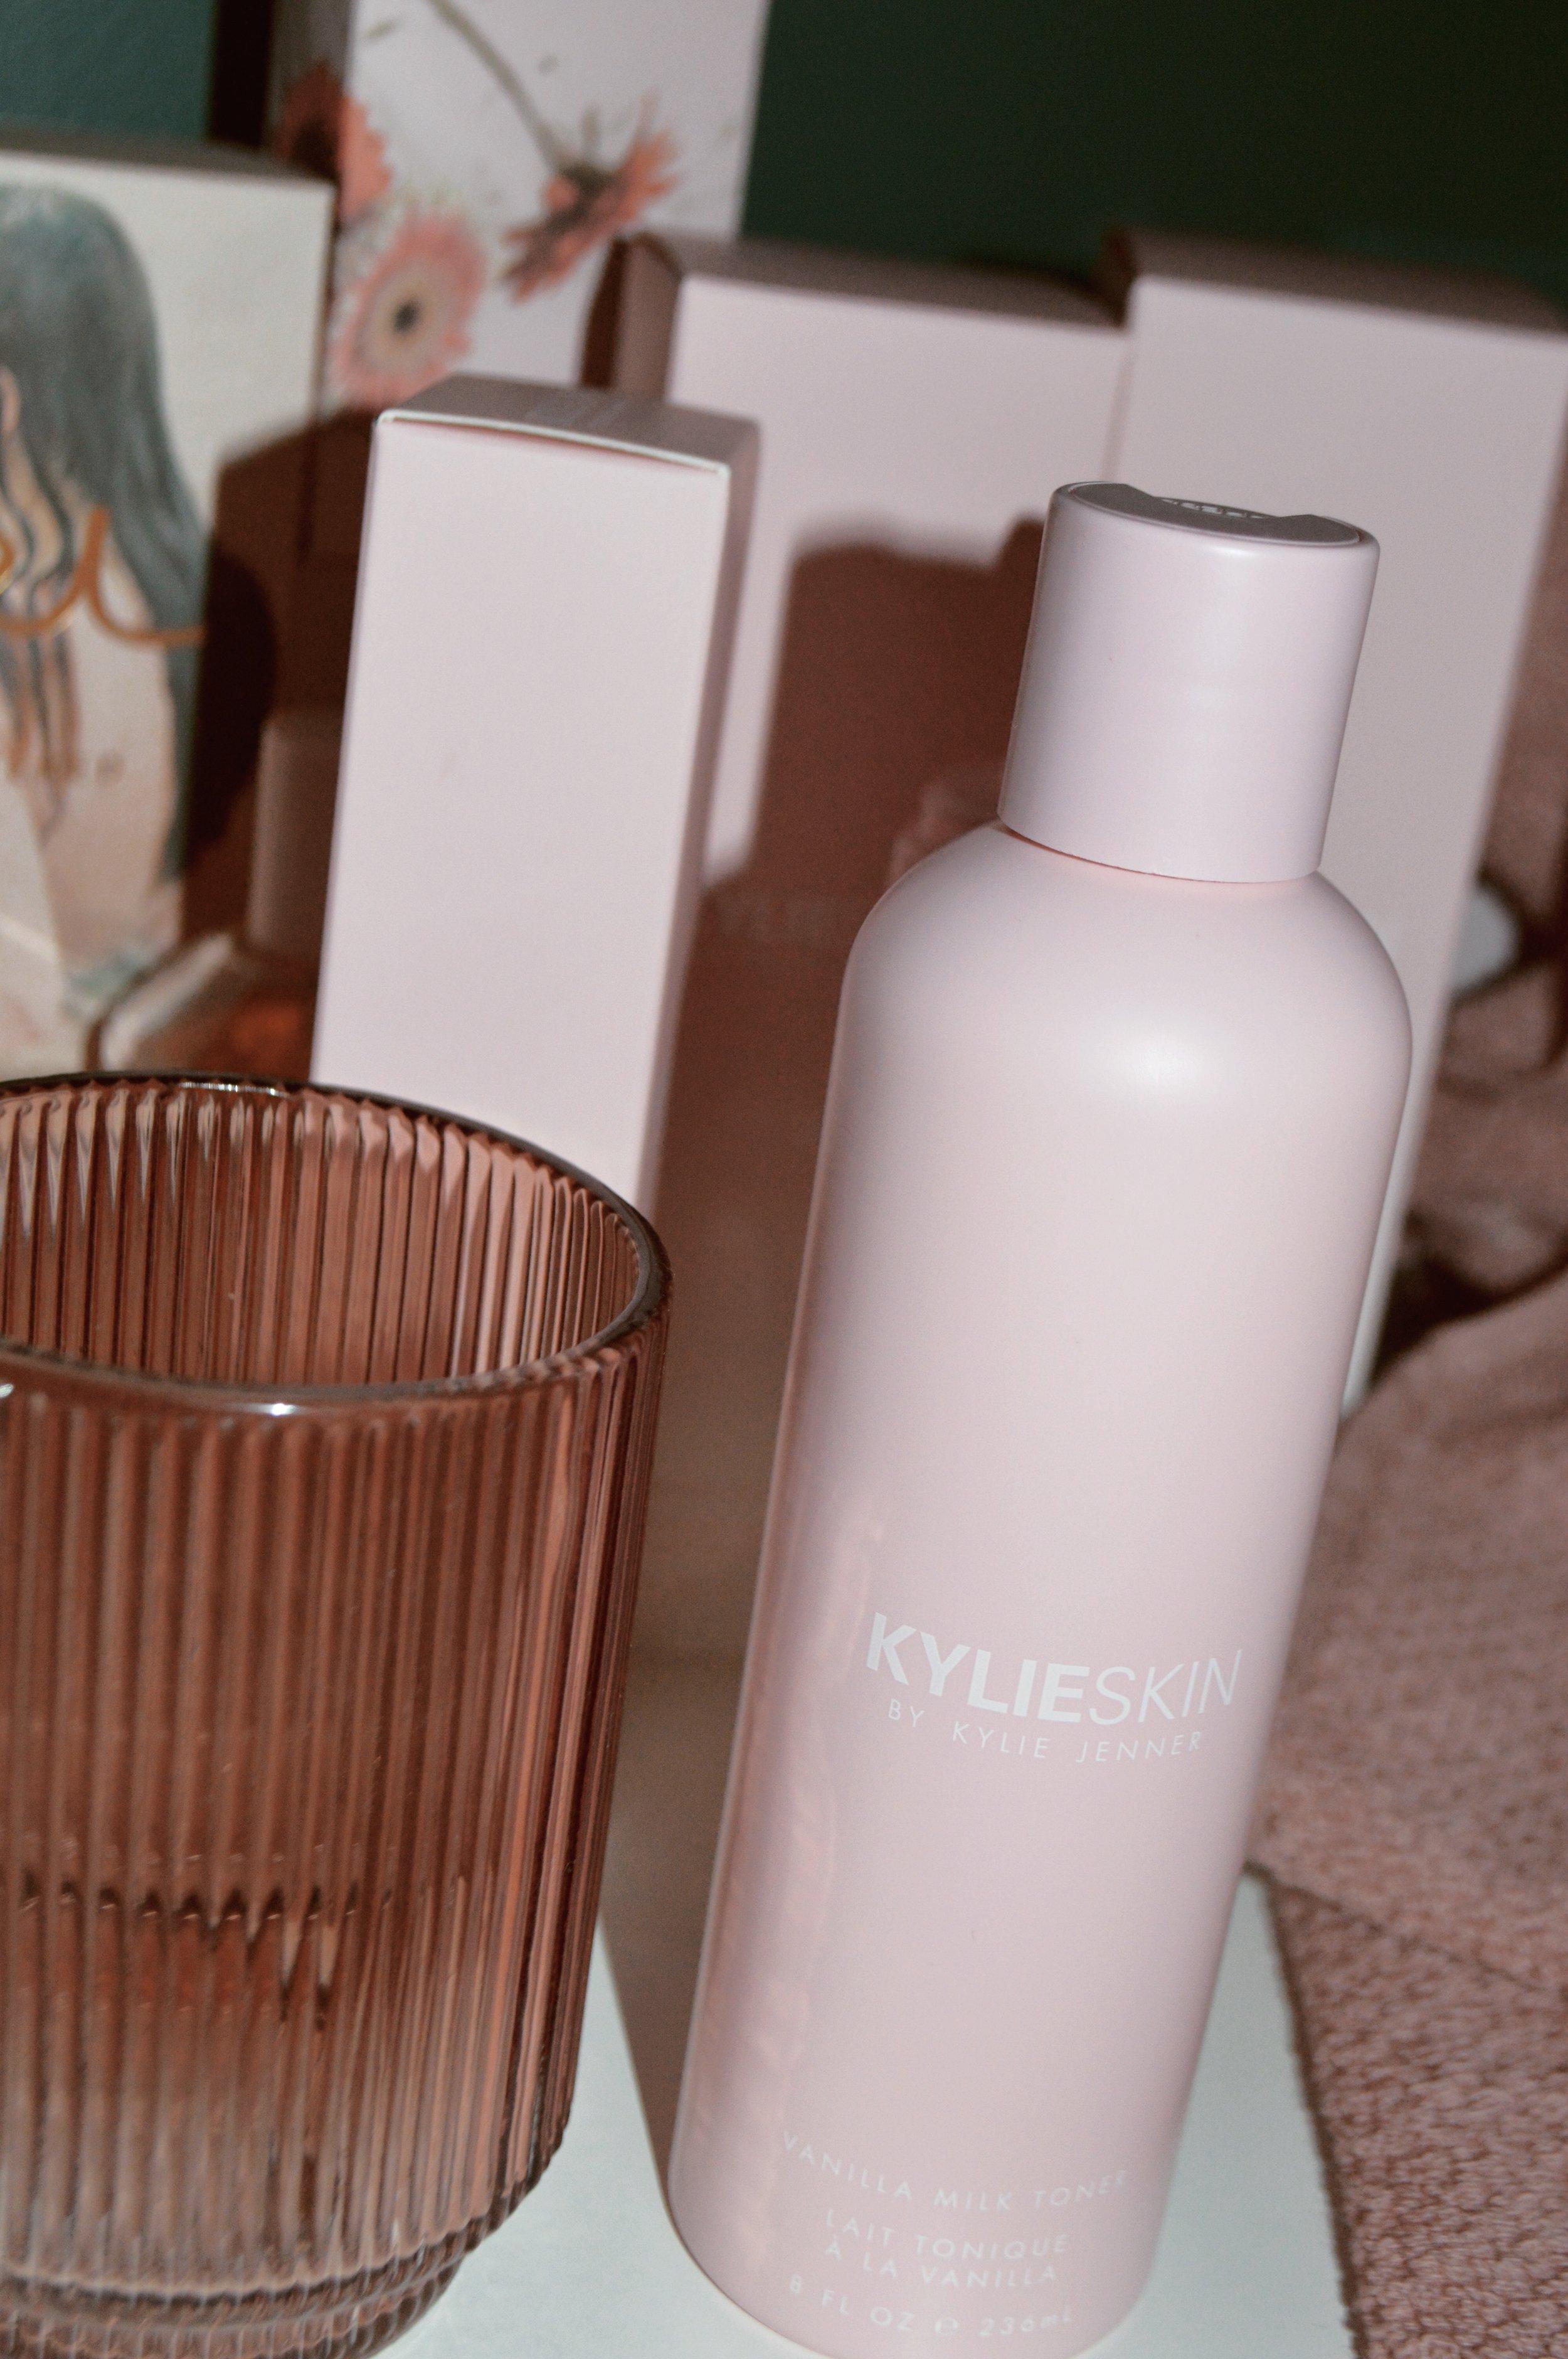 Kylie Skin_desseydoll_7.jpg